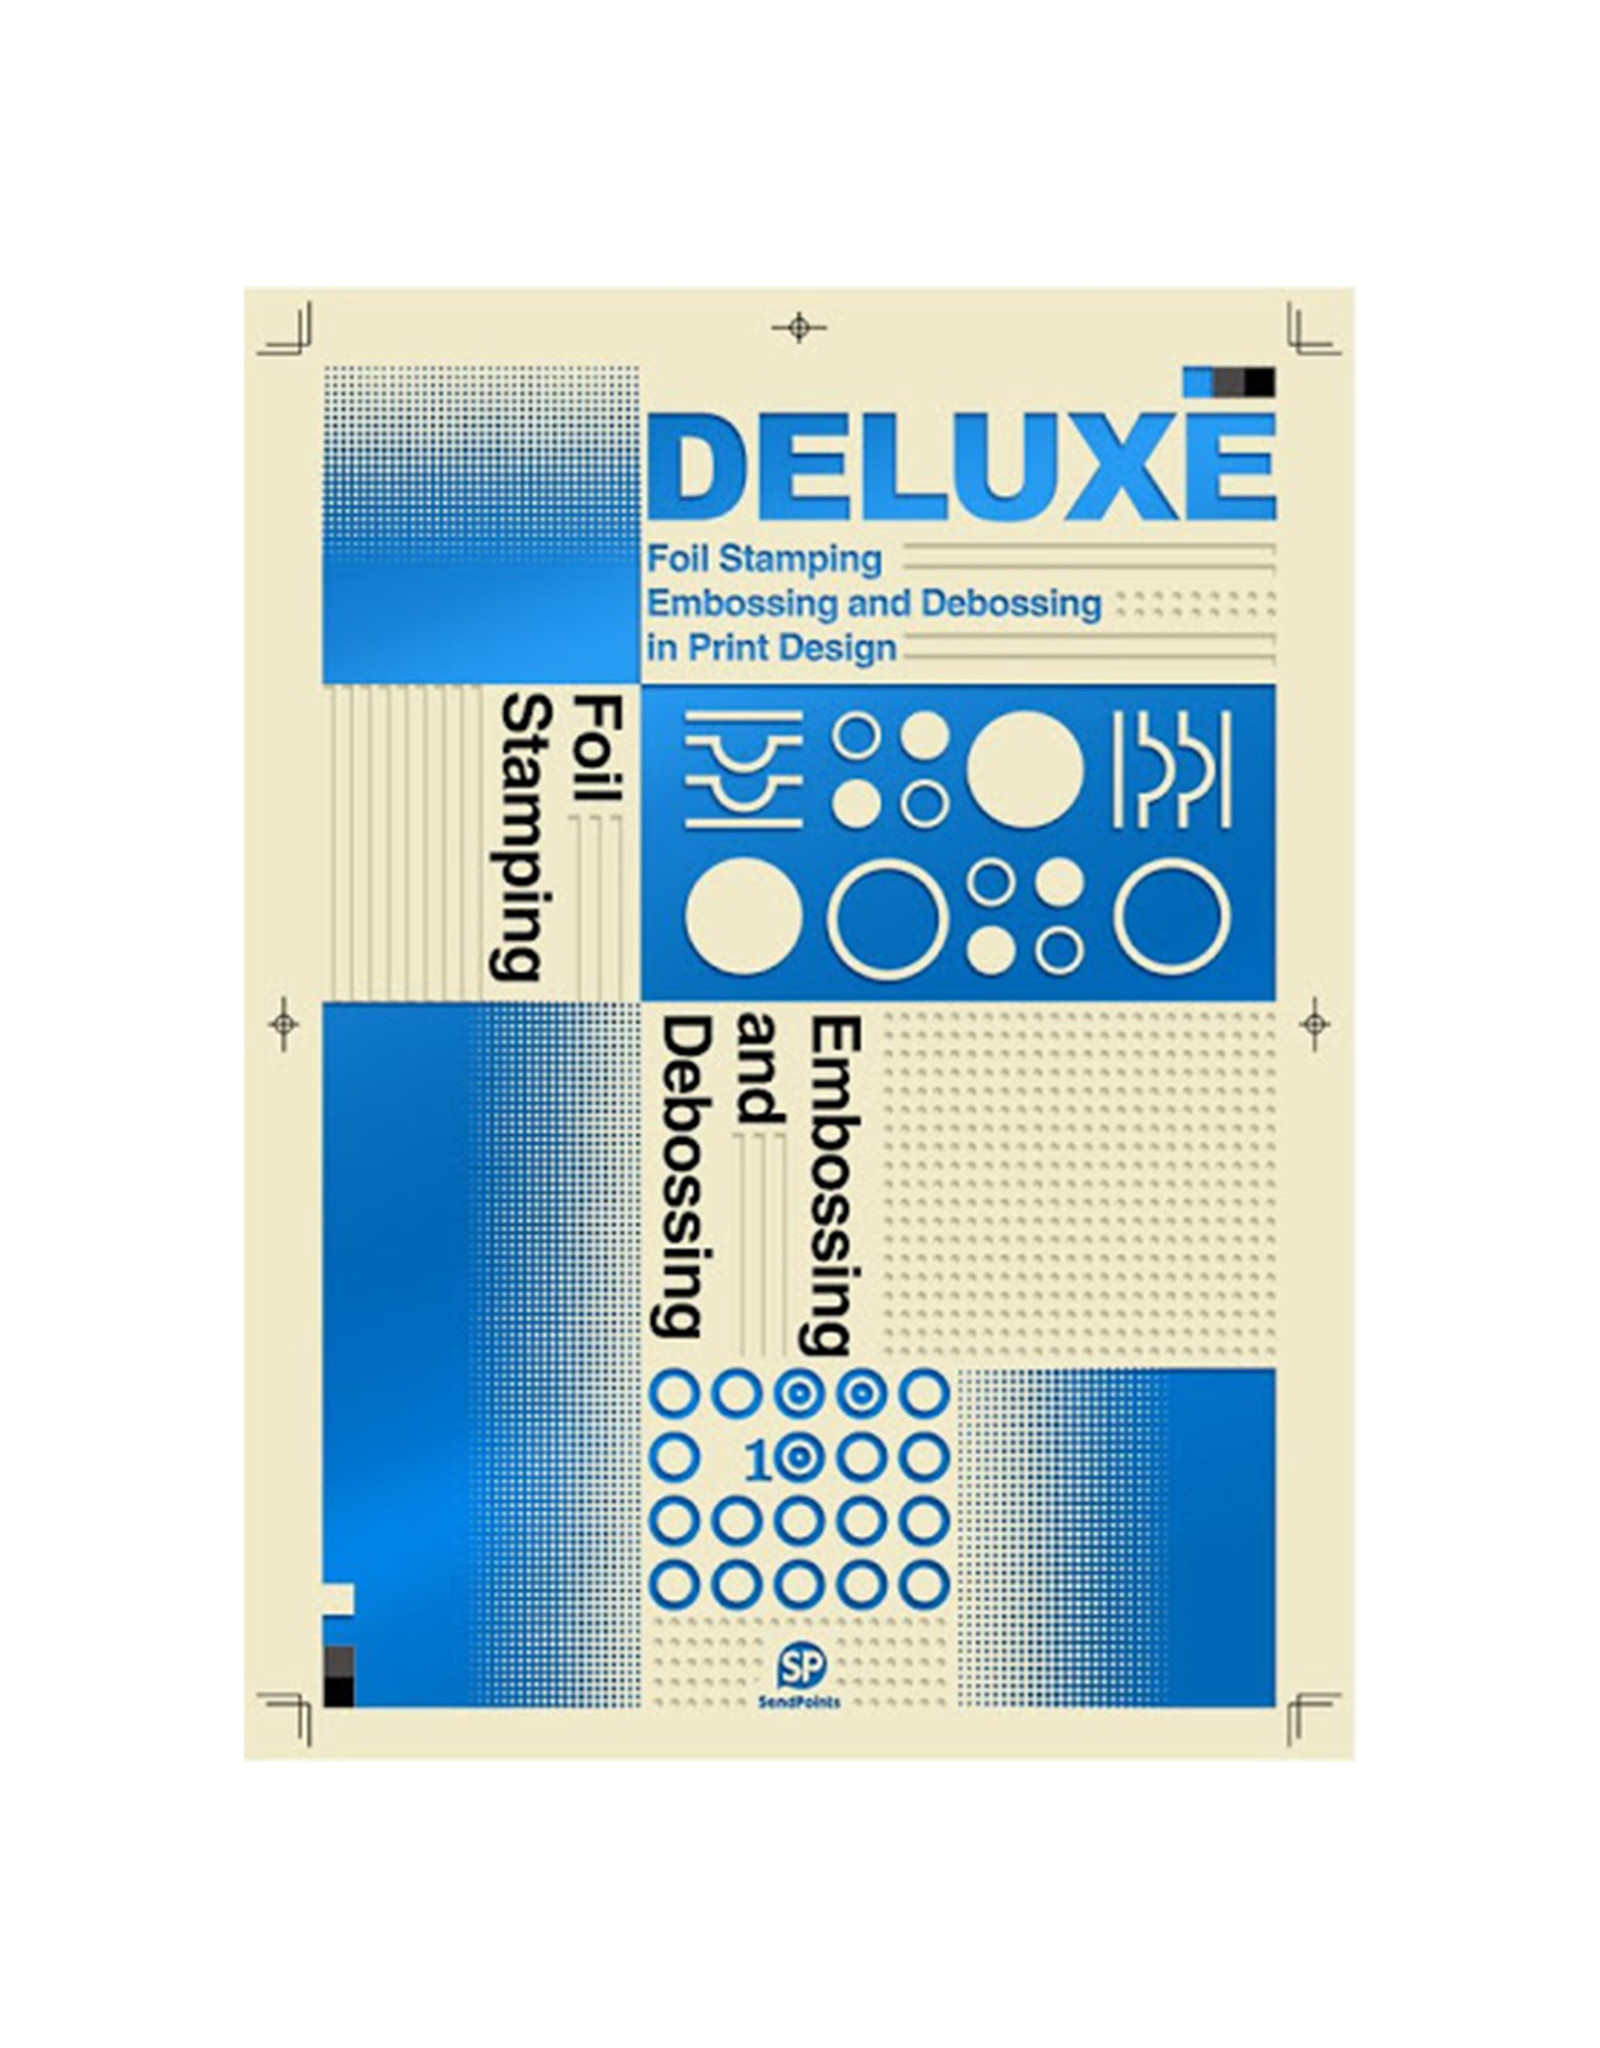 Deluxe: Foil Stamping, Embossing and Debossing in Print Design